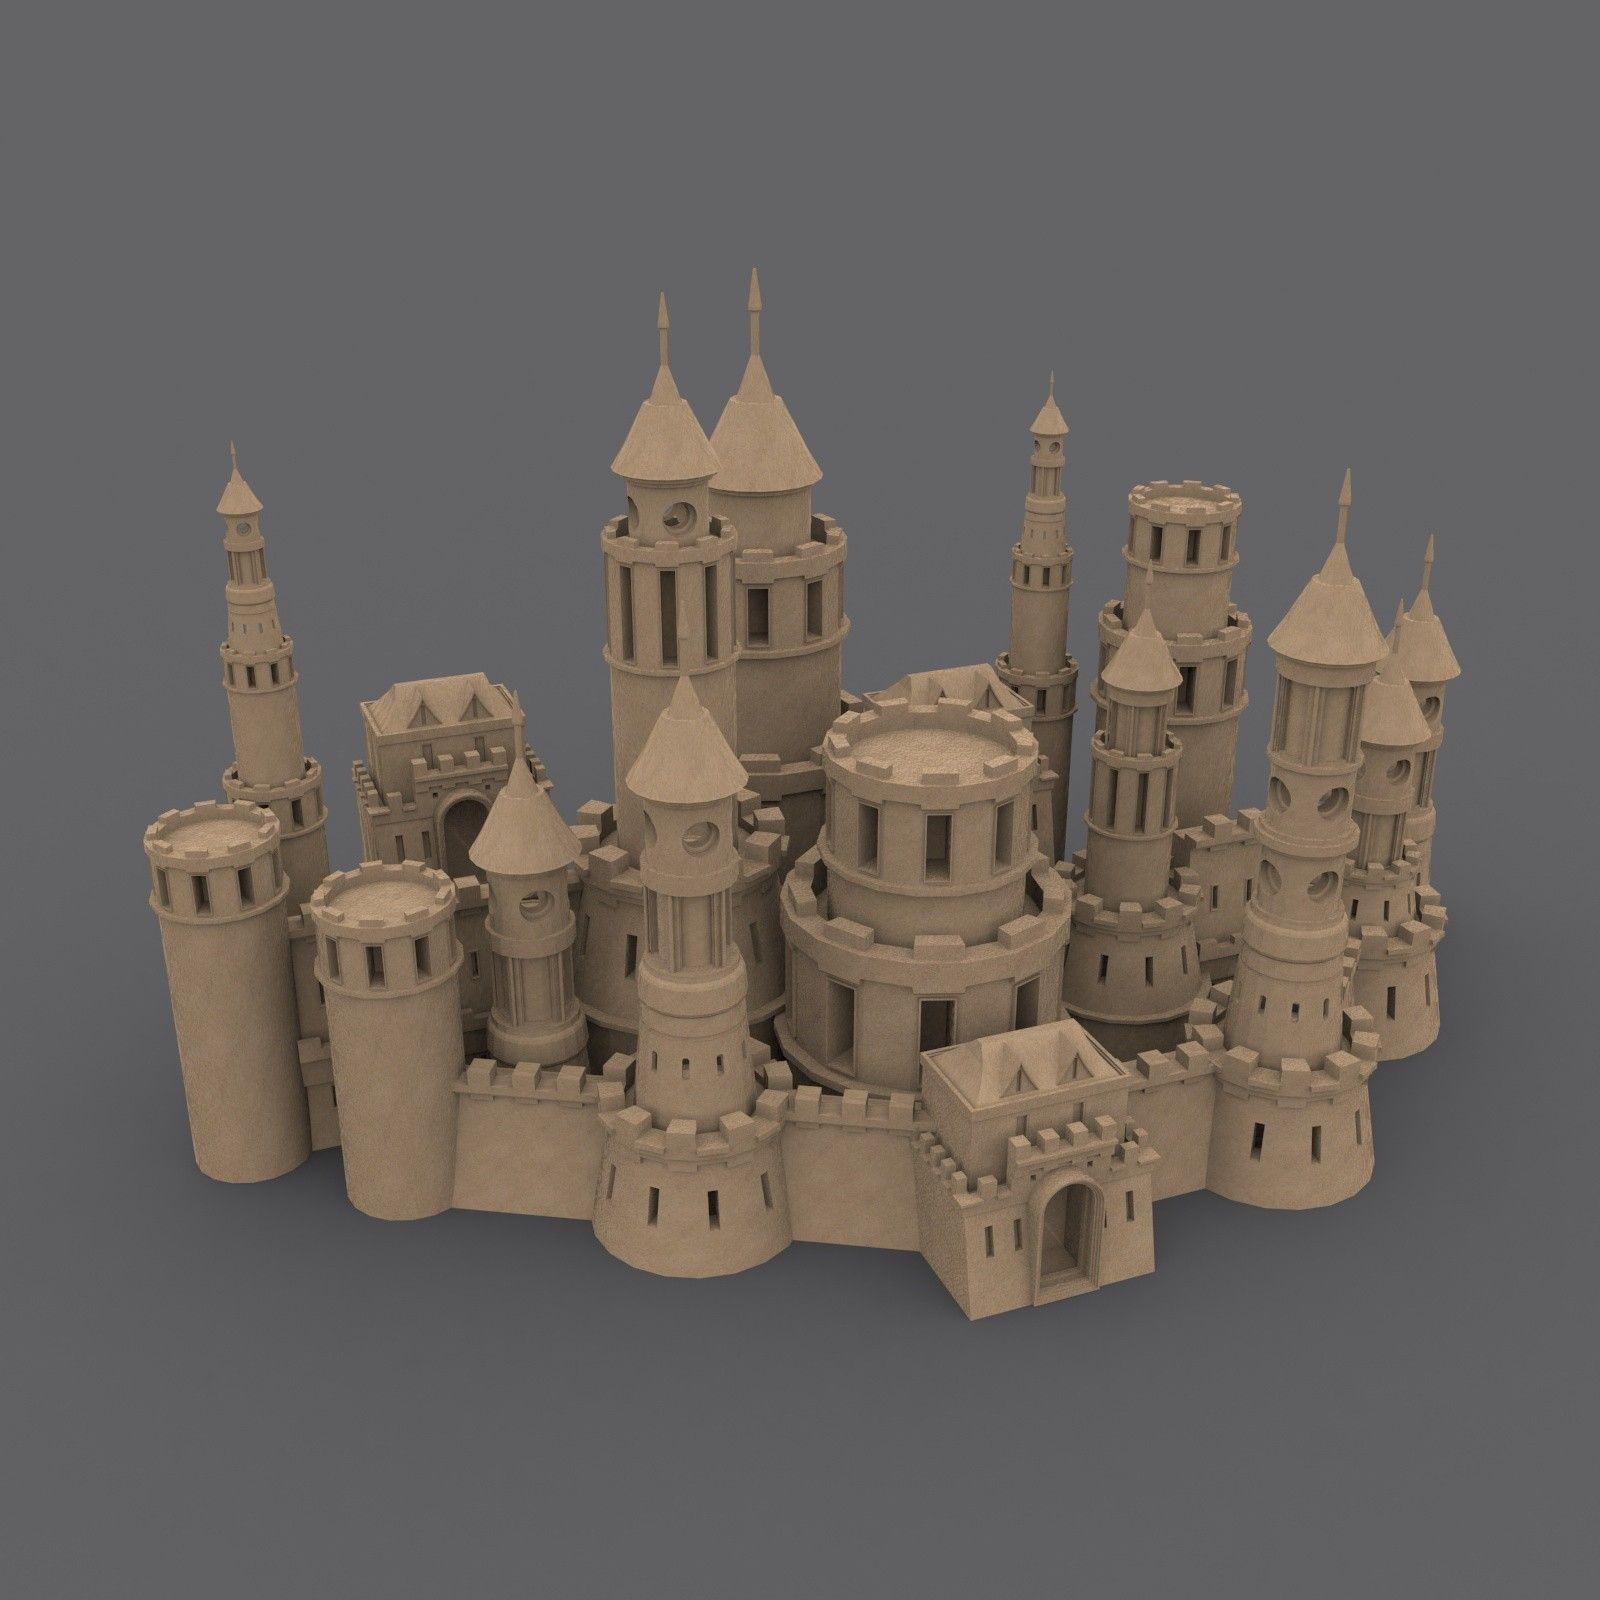 3d model castle medieval | playroom idea/toys | Model castle